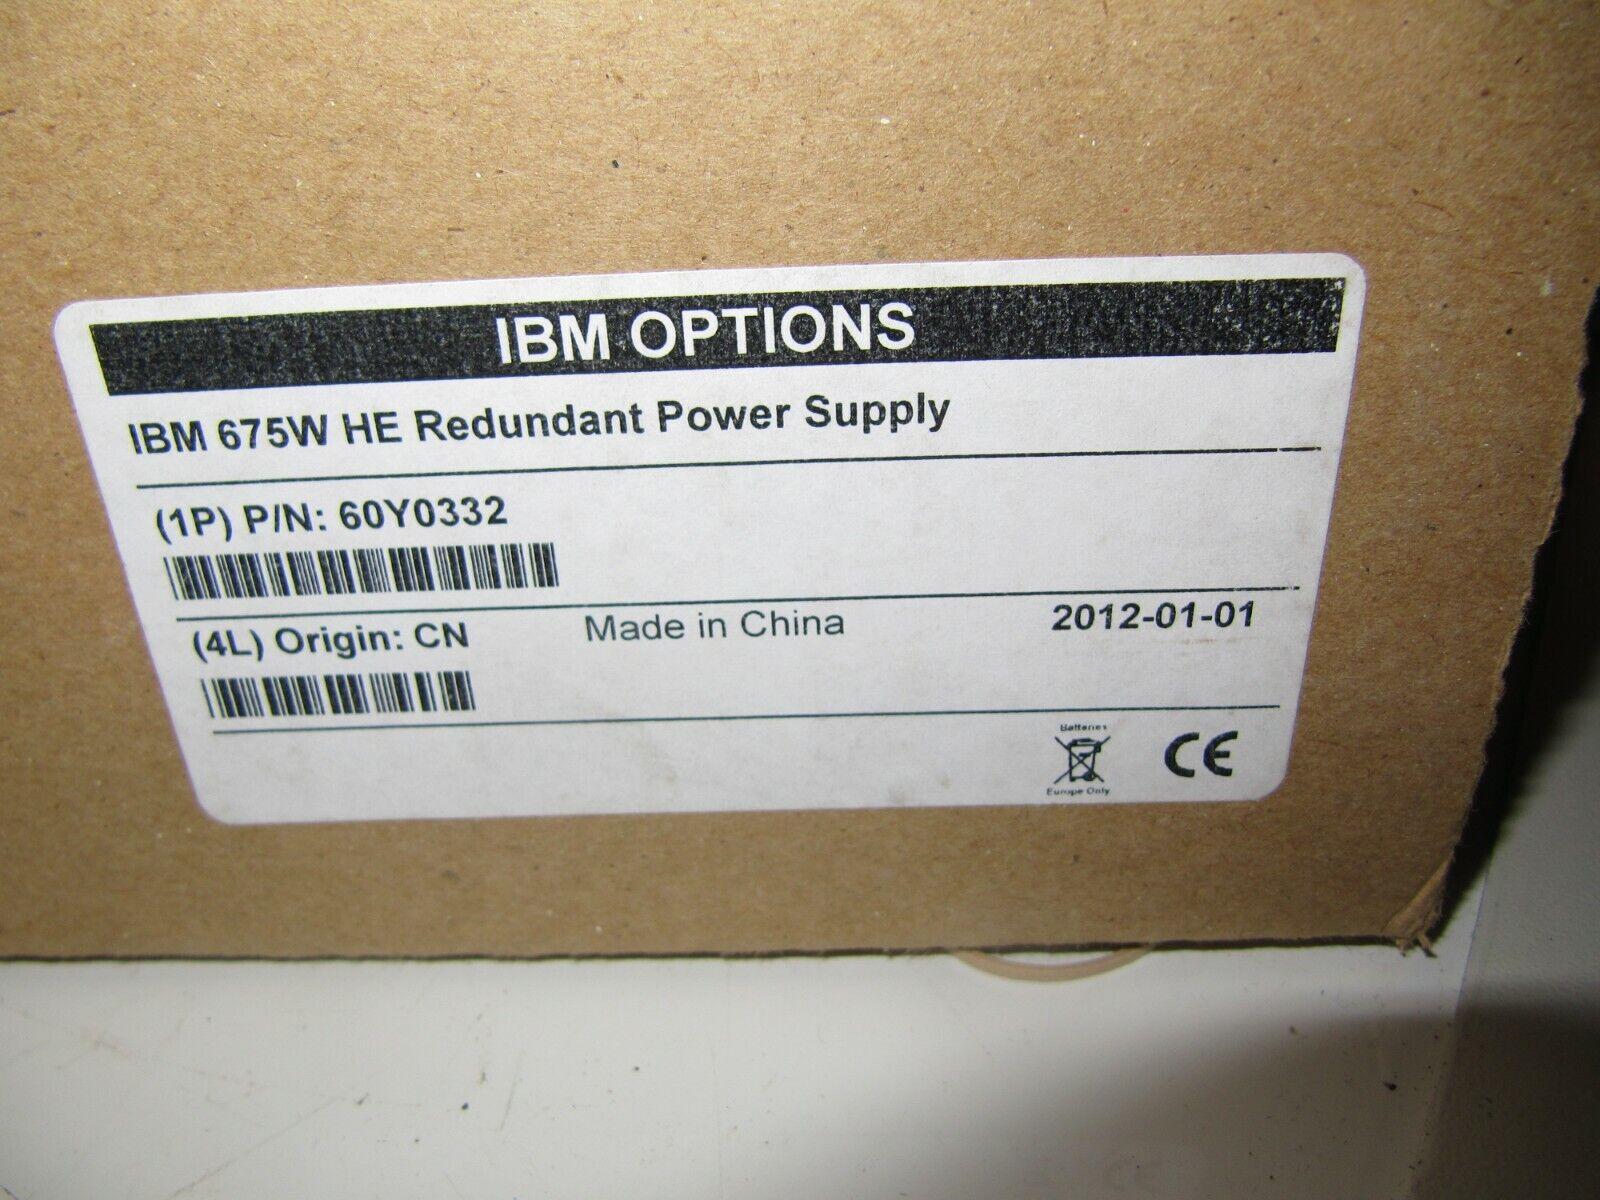 60Y0332 IBM 60Y0332 IBM High Efficiency 675W Power Supply IBM 675W HE Redundant Power Supply murah.